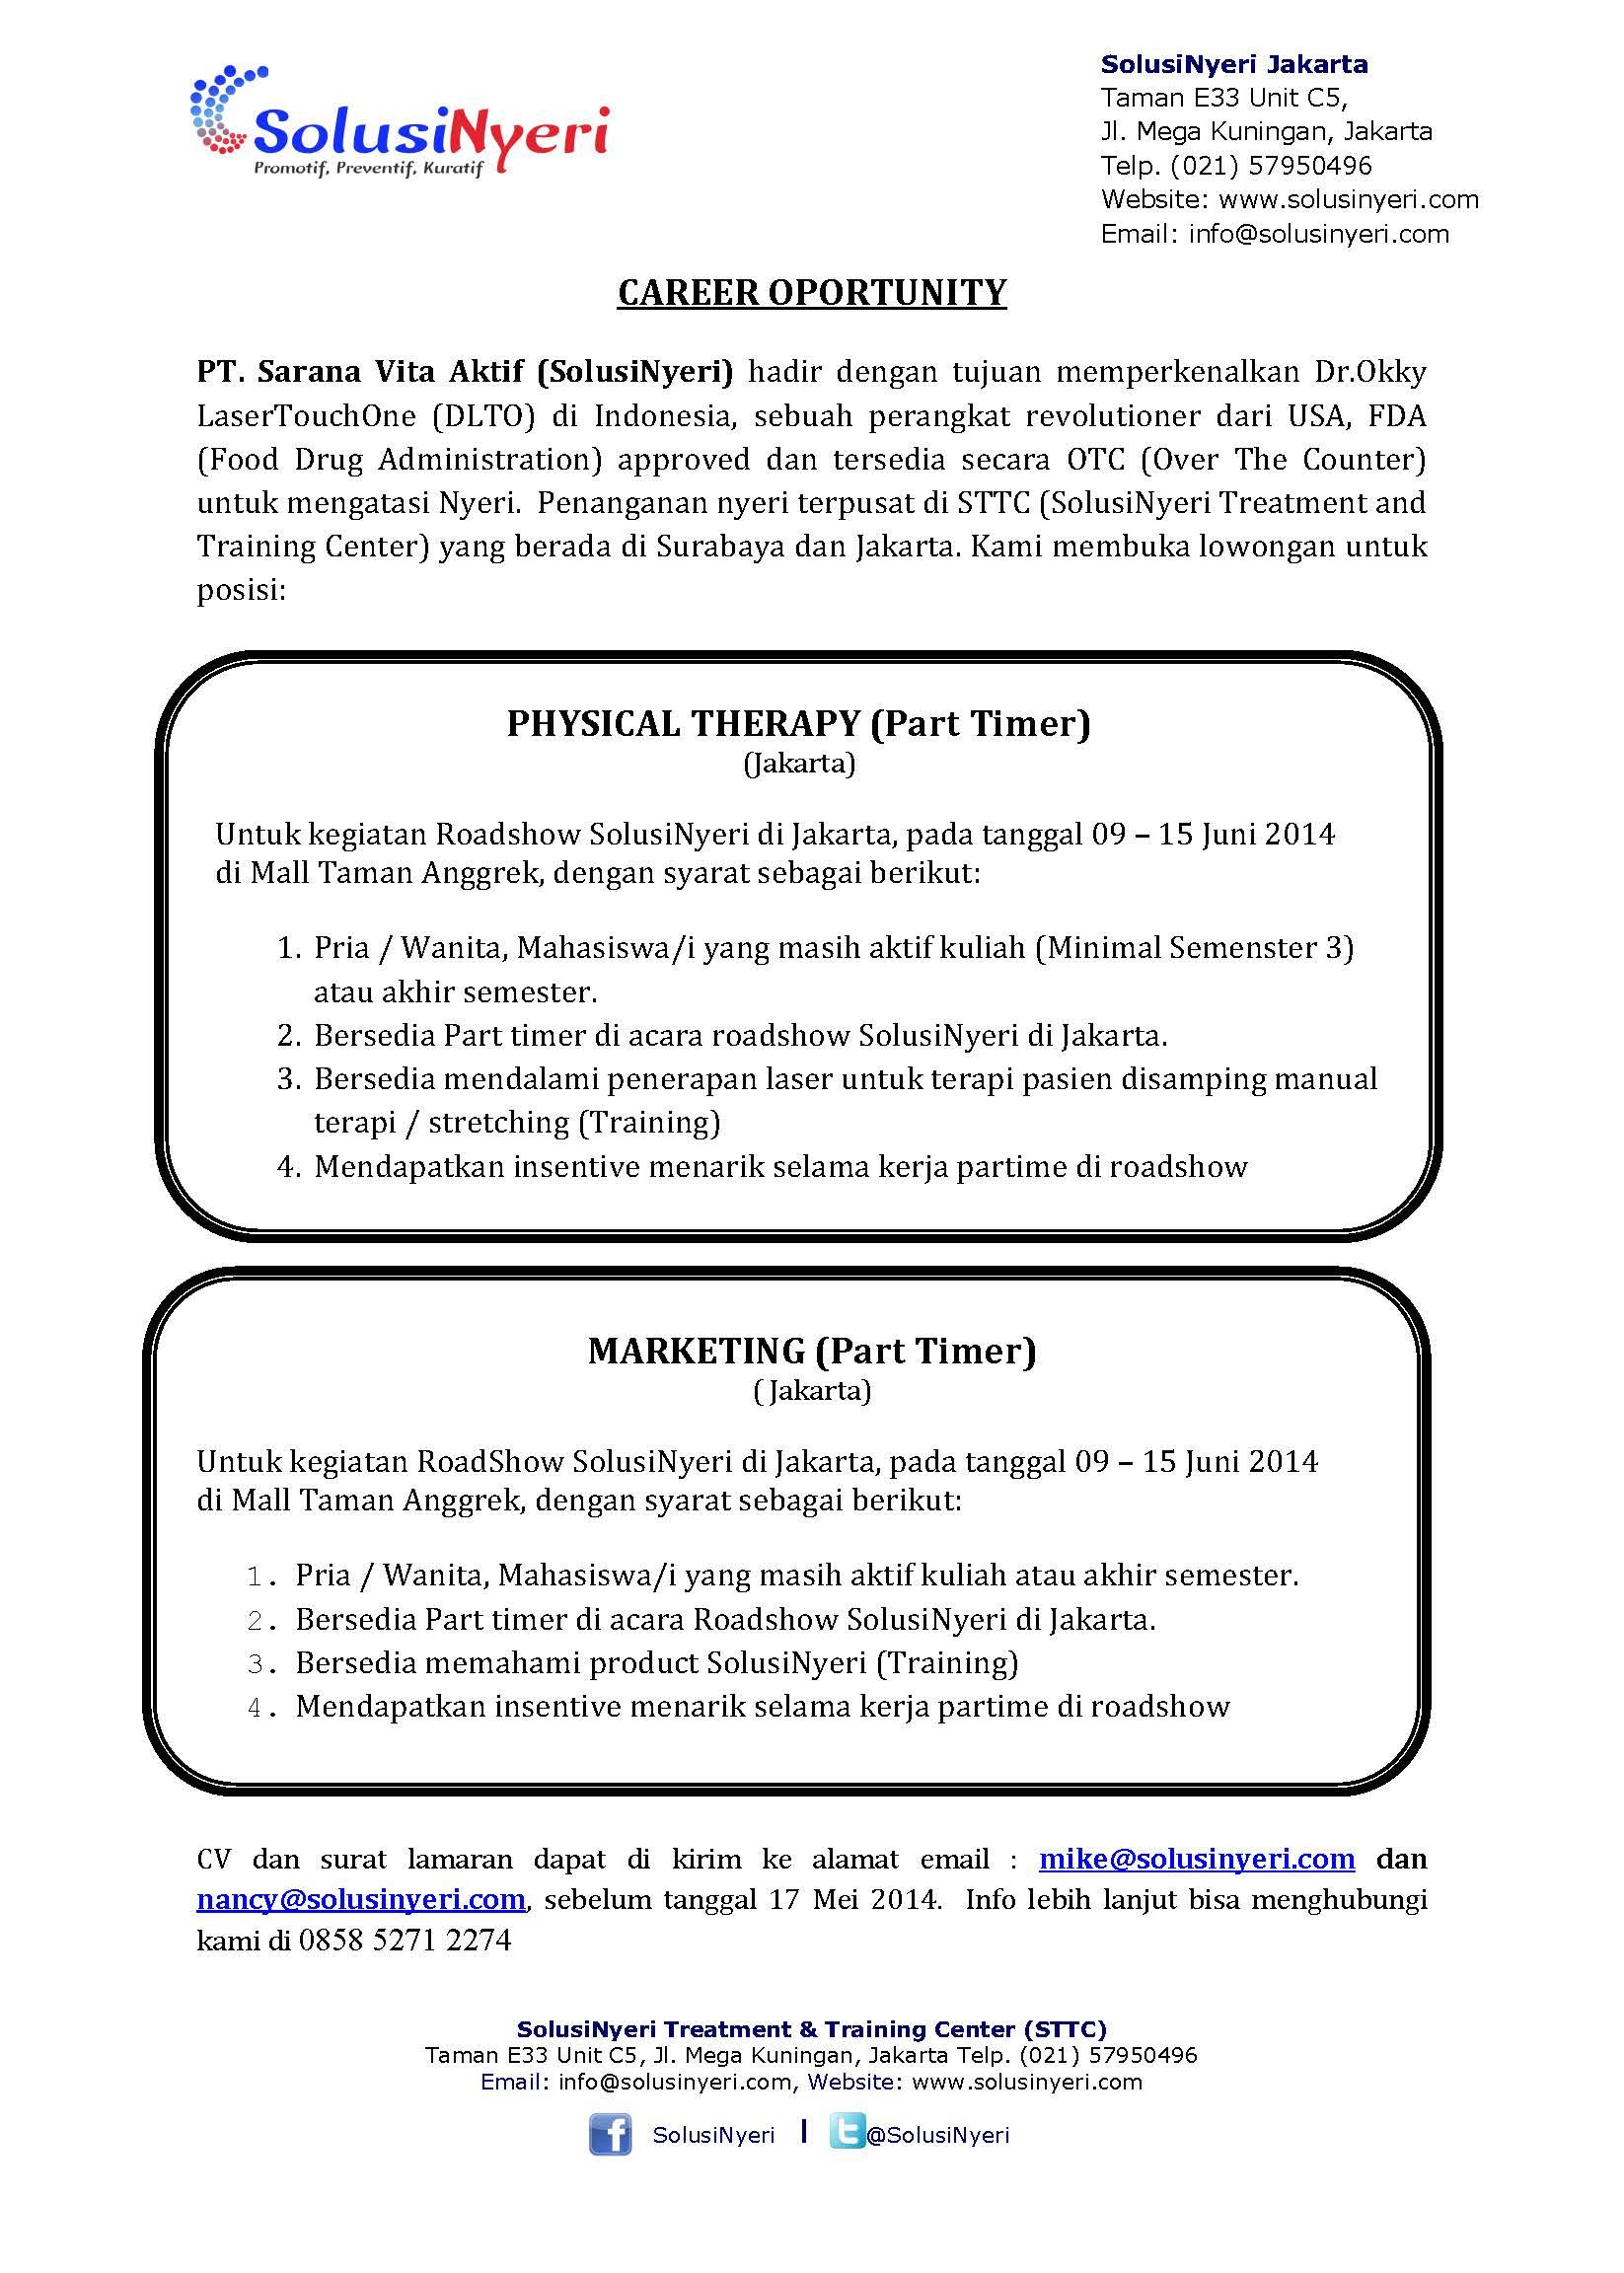 Physical Therapy (Part Timer) – PT. Sarana Vita Aktif (SolusiNyeri)